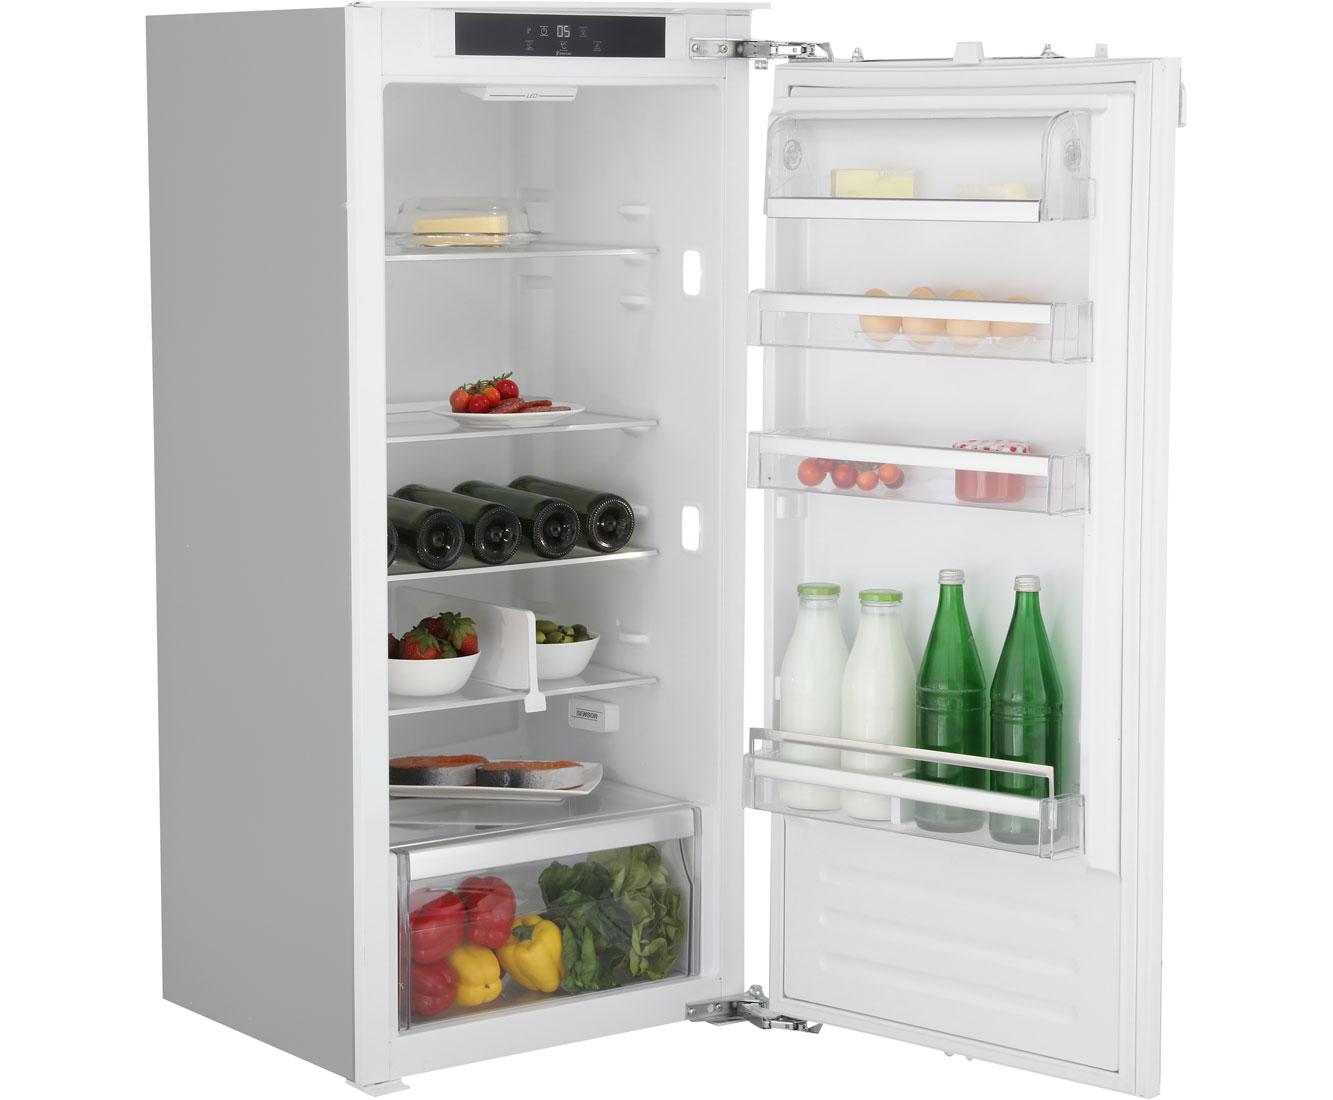 Aeg Kühlschrank Festtür Montage : Bauknecht krie 2124 a einbau kühlschrank 122er nische festtür